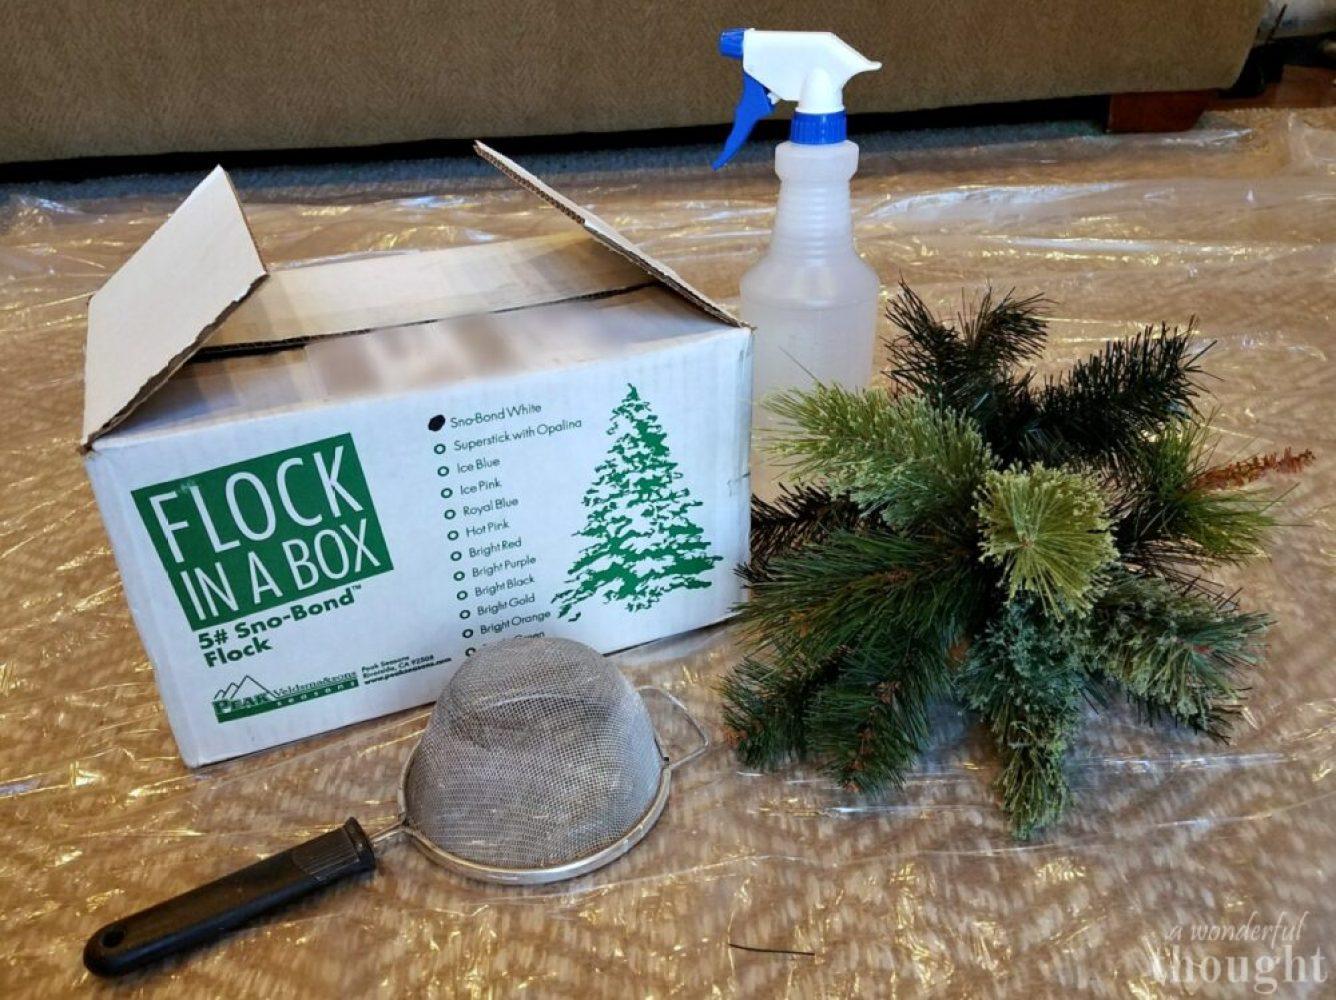 DIY Flocked Christmas Tree #christmastree #flockedtree #diyflockedtree #awonderfulthought.com